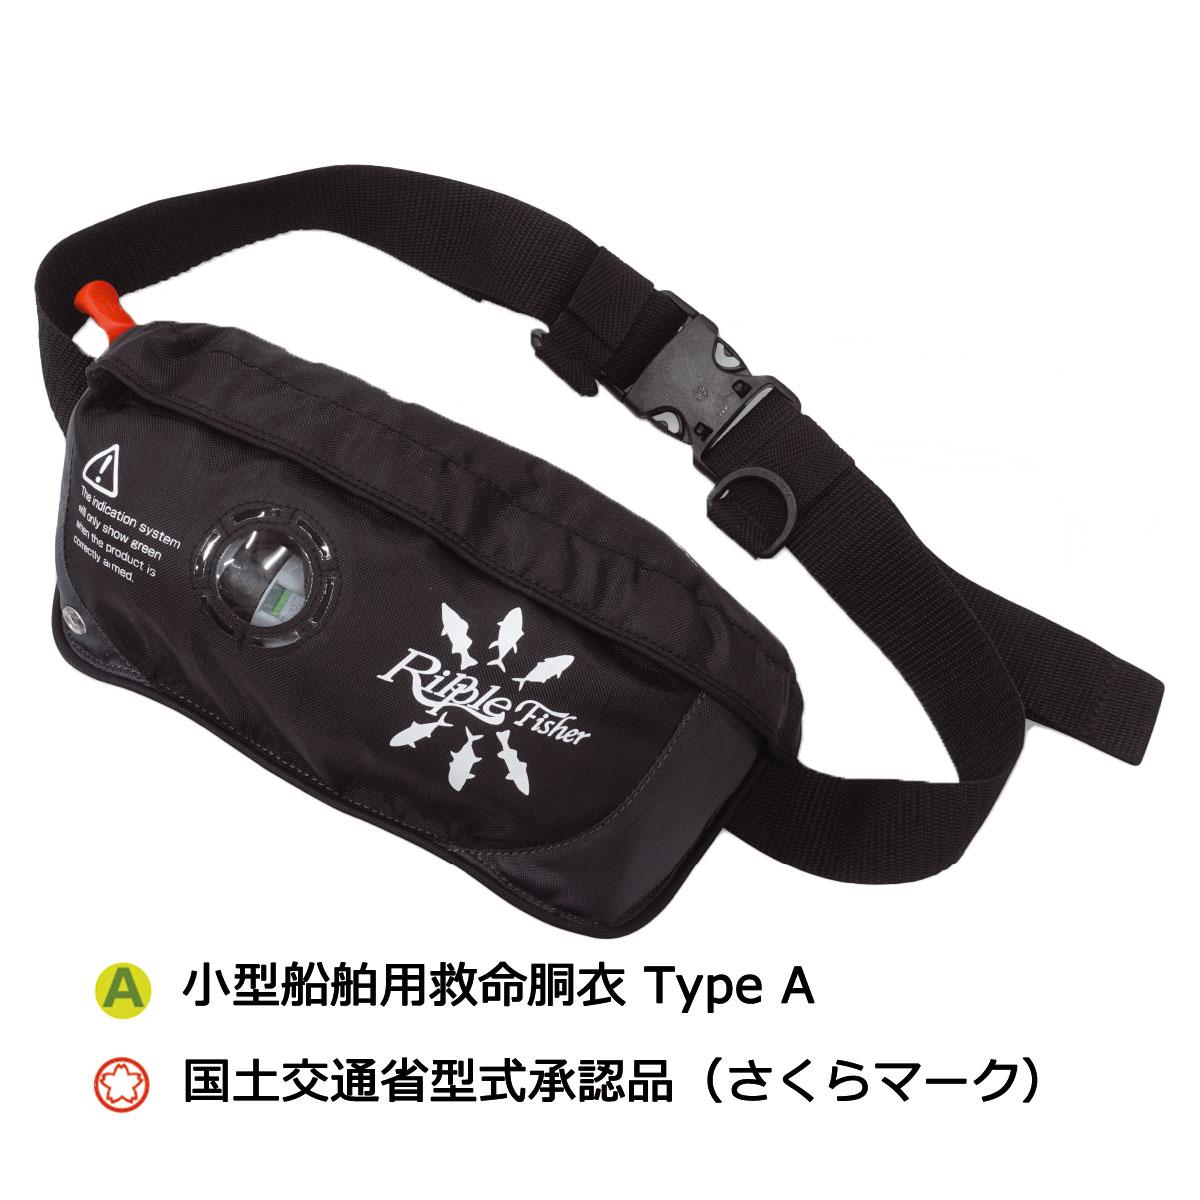 RF 自動膨張ライフジャケット ポーチタイプ